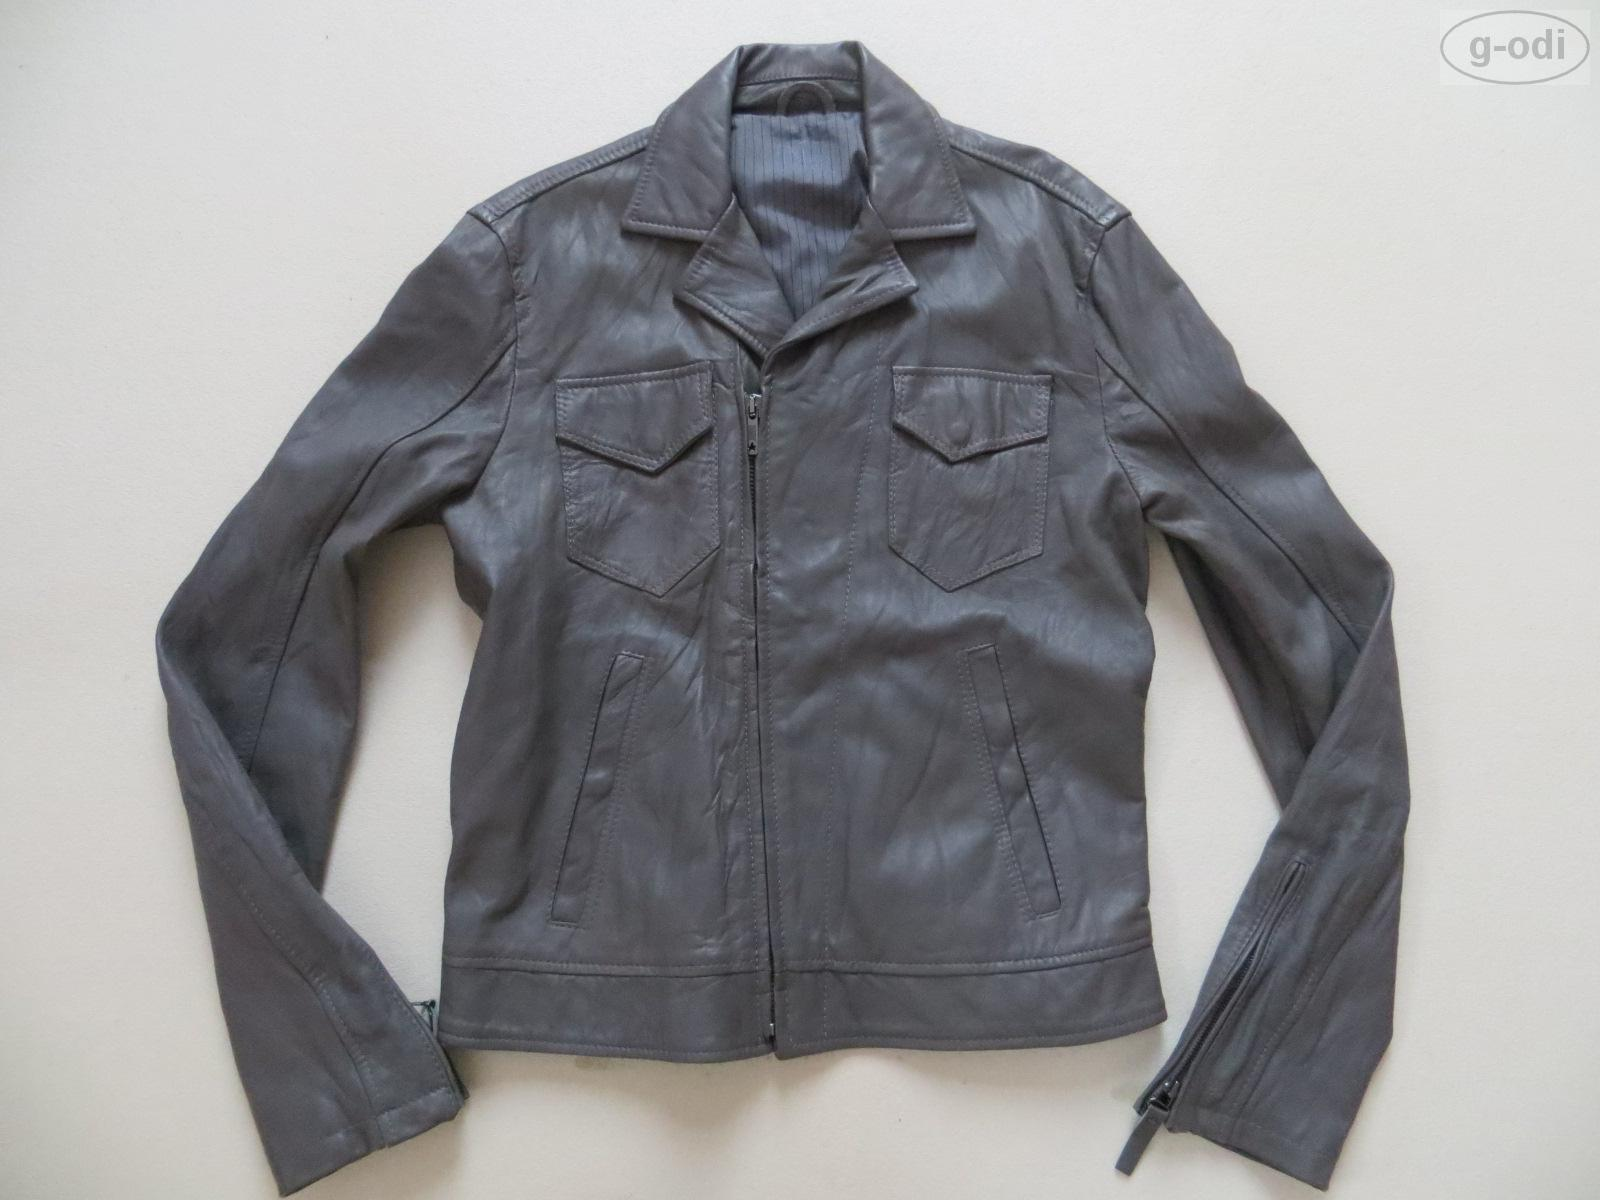 levi 39 s damen biker jeans jacke lederjacke gr l grau wie neu echt leder ebay. Black Bedroom Furniture Sets. Home Design Ideas